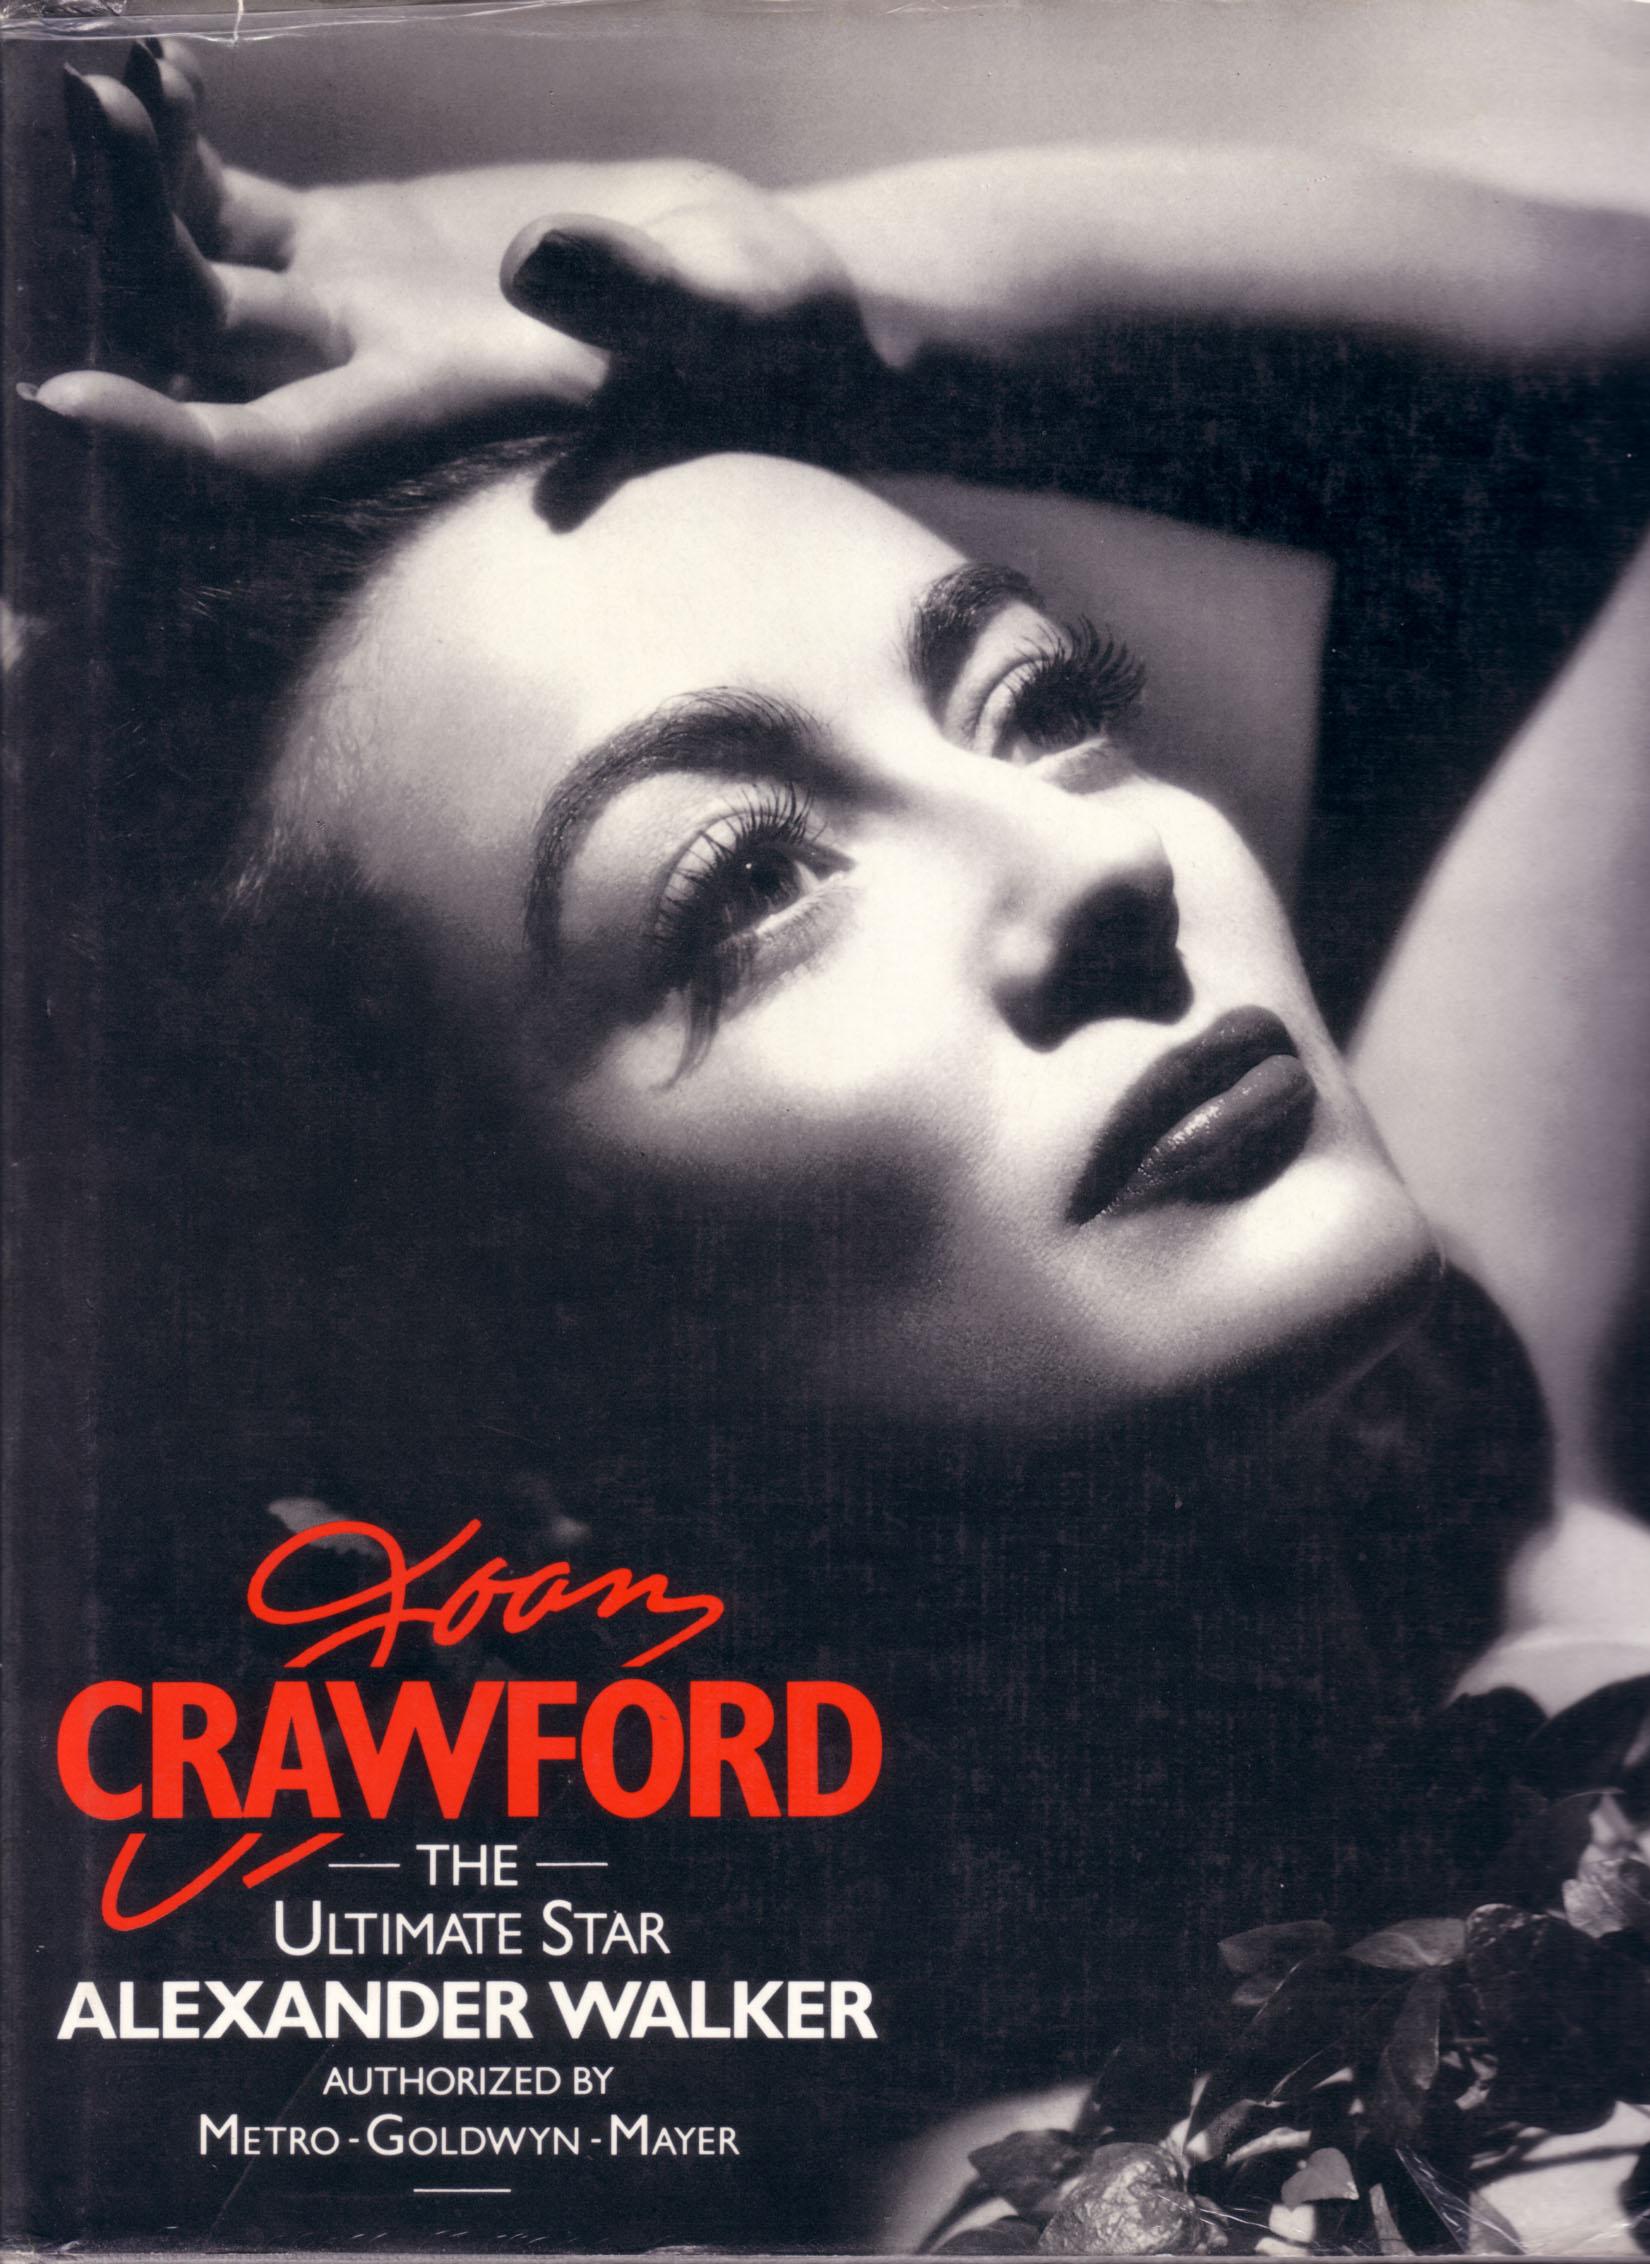 Joan Crawford, the Ultimate Star